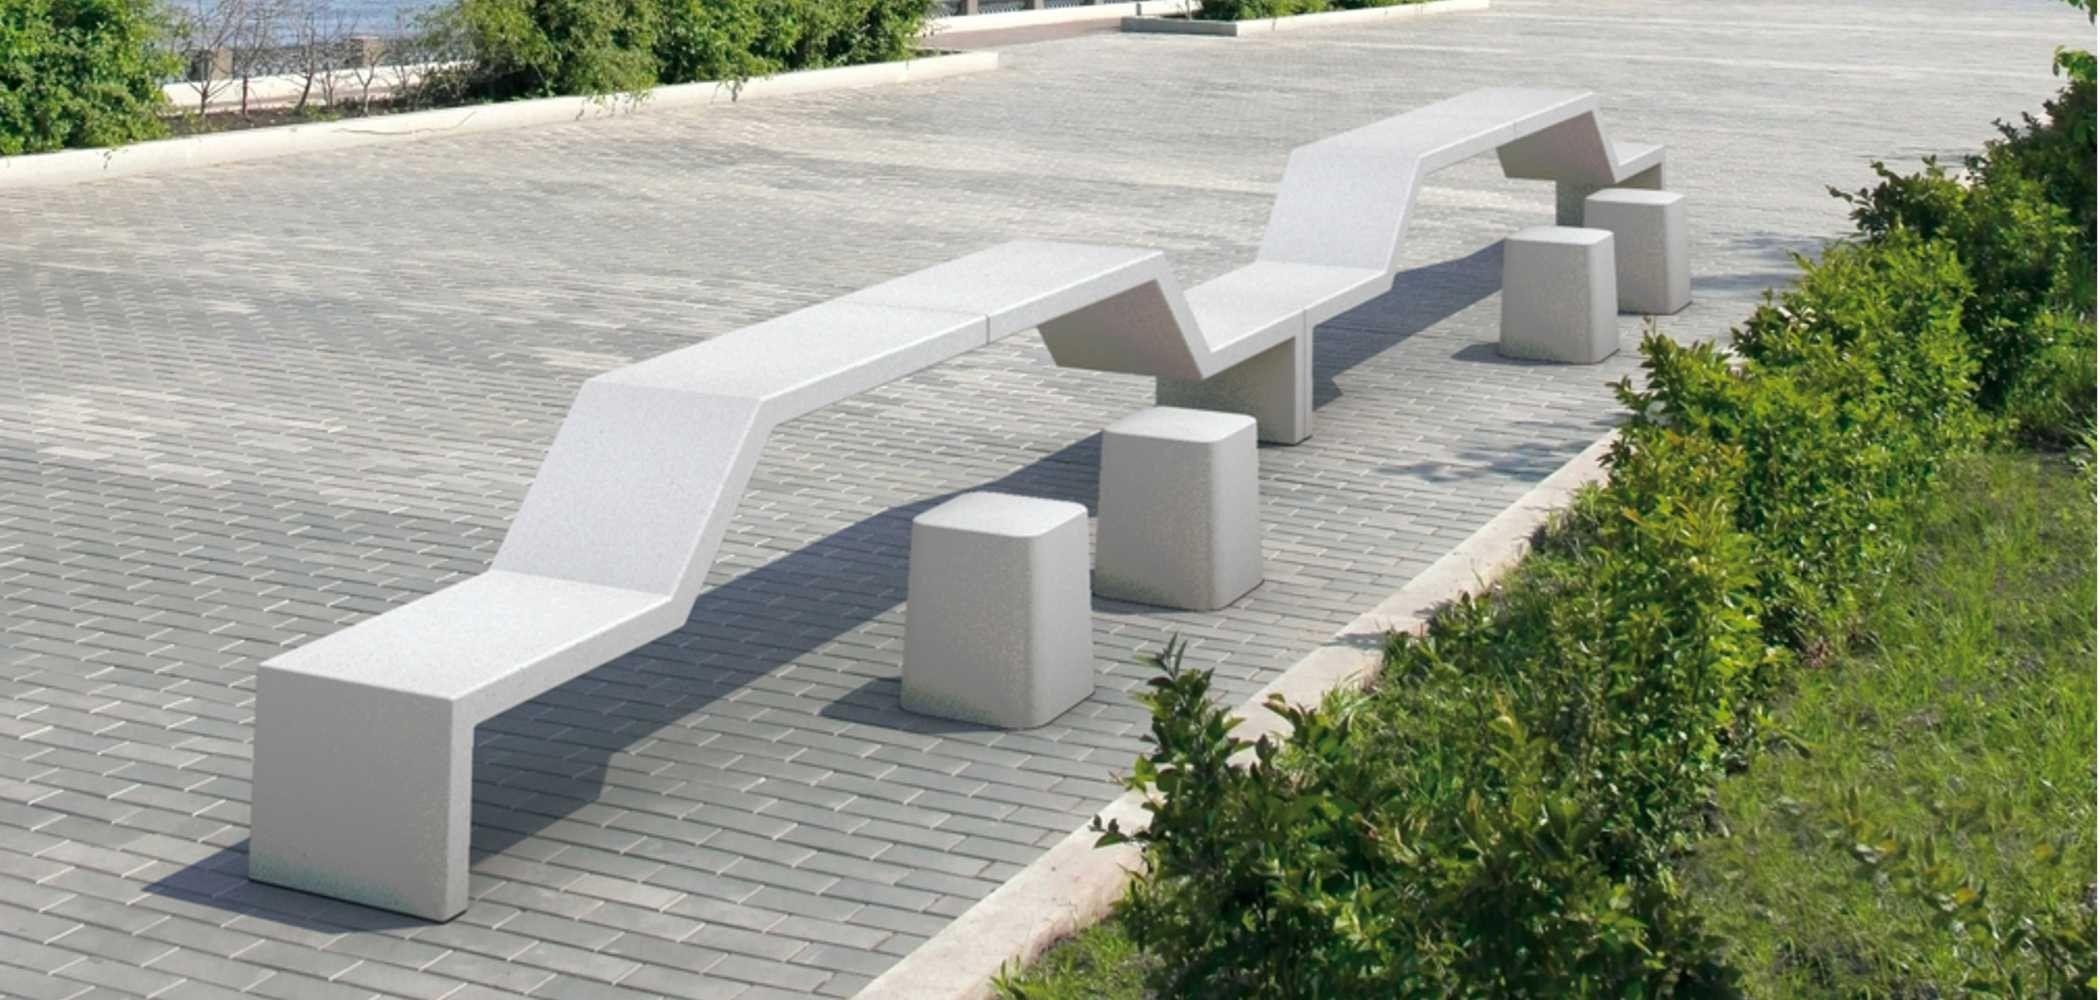 Panchina modulare in pietra ricostruita senza schienale for Panchine arredo urbano prezzi